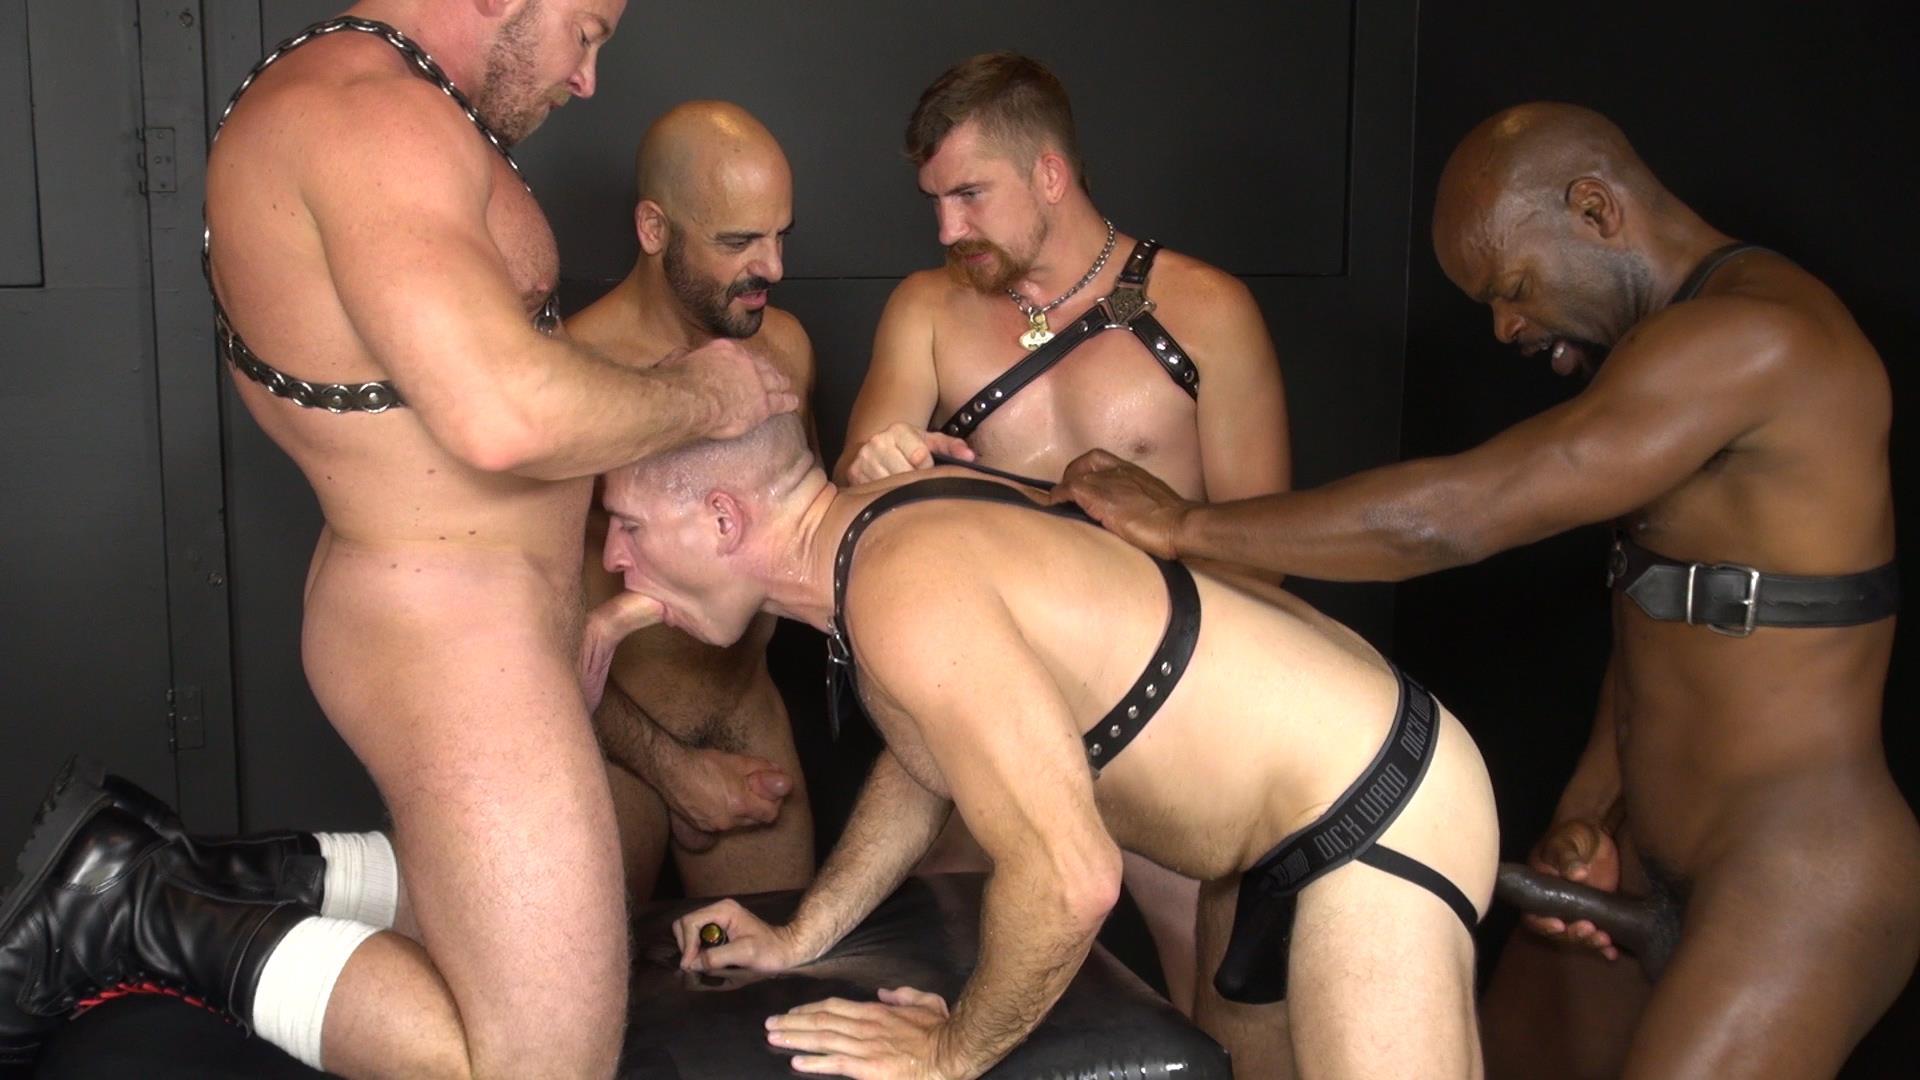 Raw-and-Rough-Ken-Byker-Dayton-OConnor-Trelino-Shay-Michaels-Adam-Russo-Cutler-X-Interracial-Bareback-Orgy-Amateur-Gay-Porn-03 Interracial Bareback Orgy With Adam Russo & Cutler X